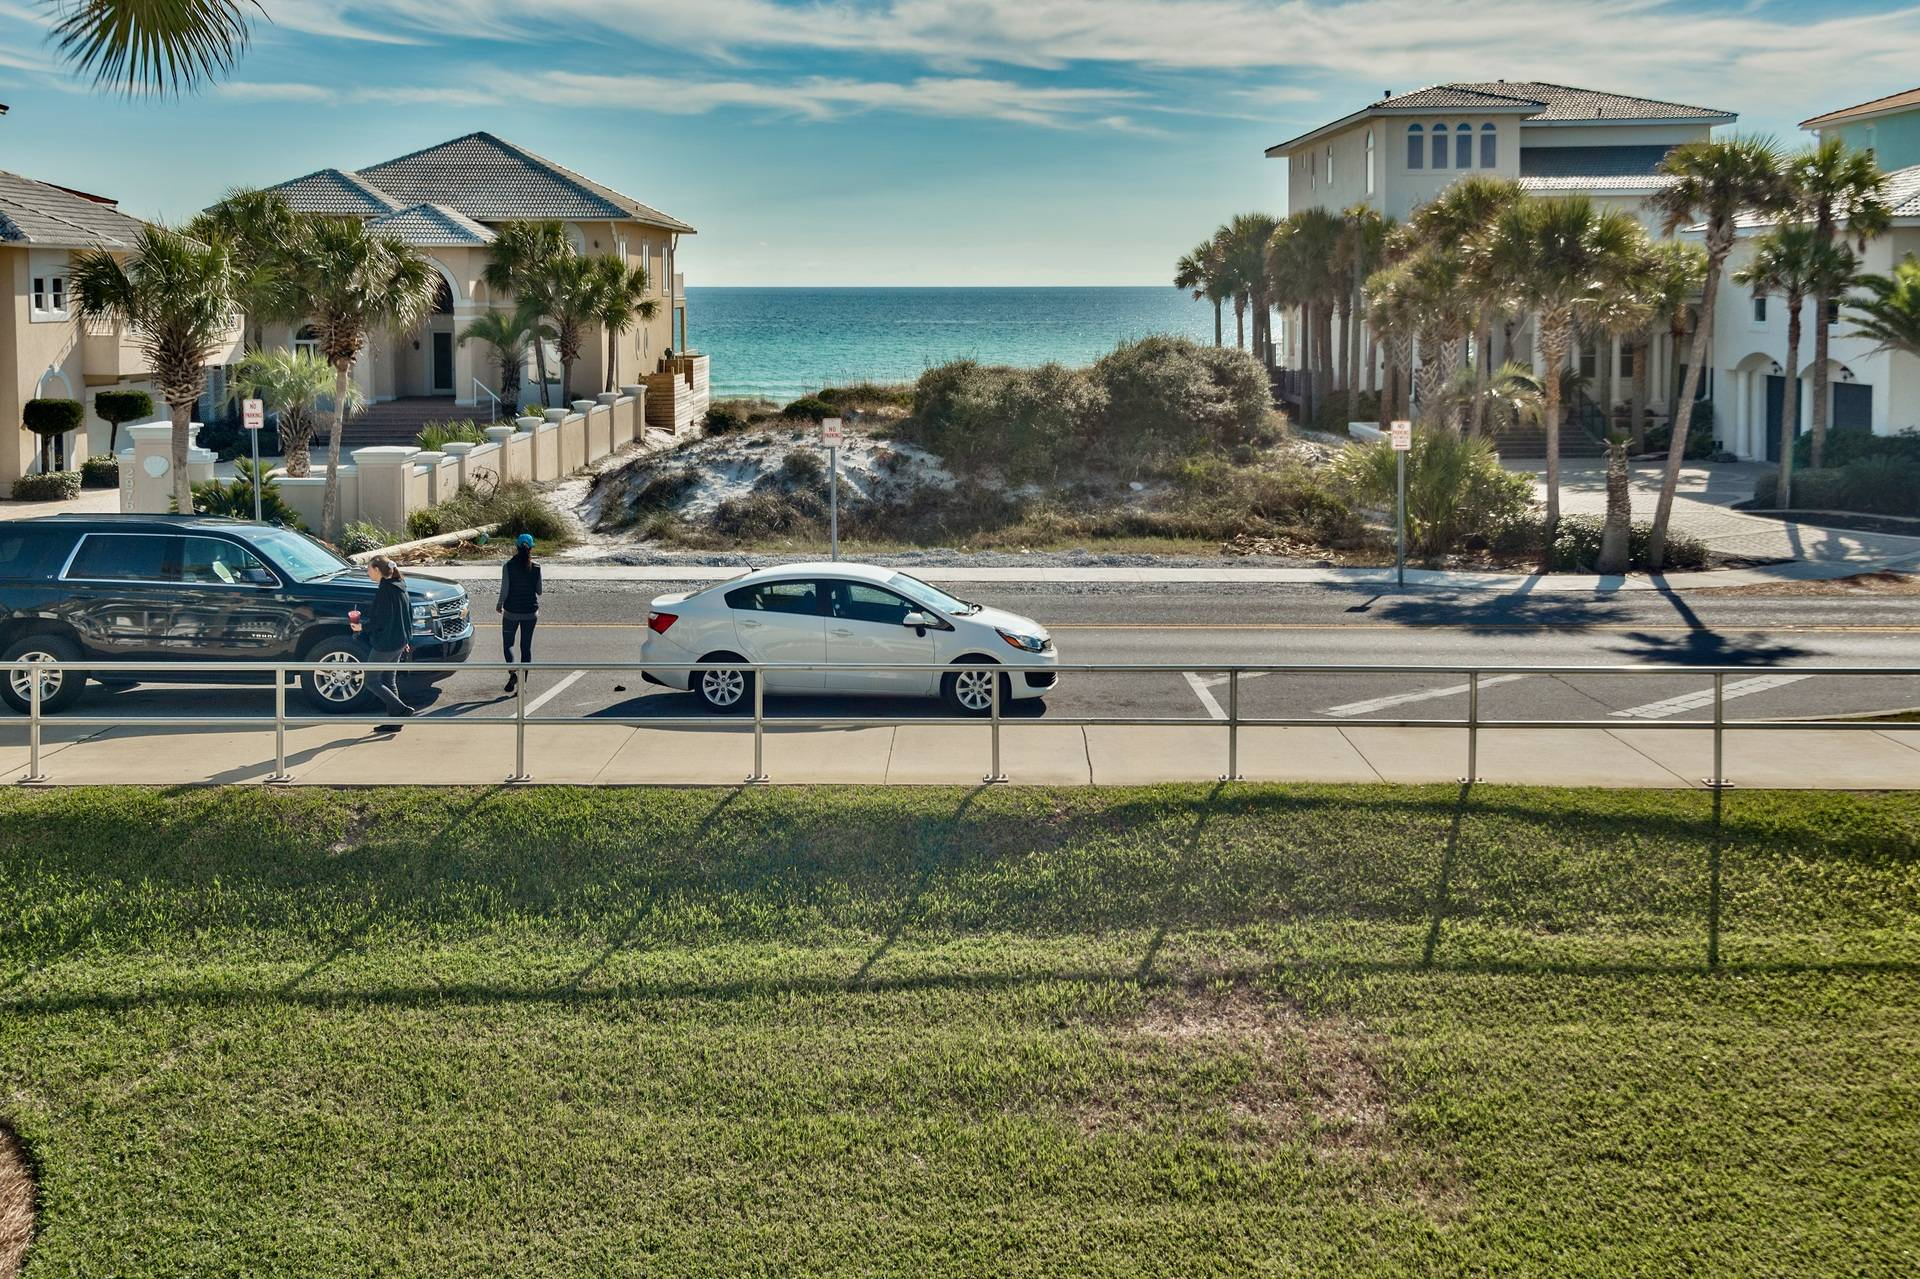 Gulf View